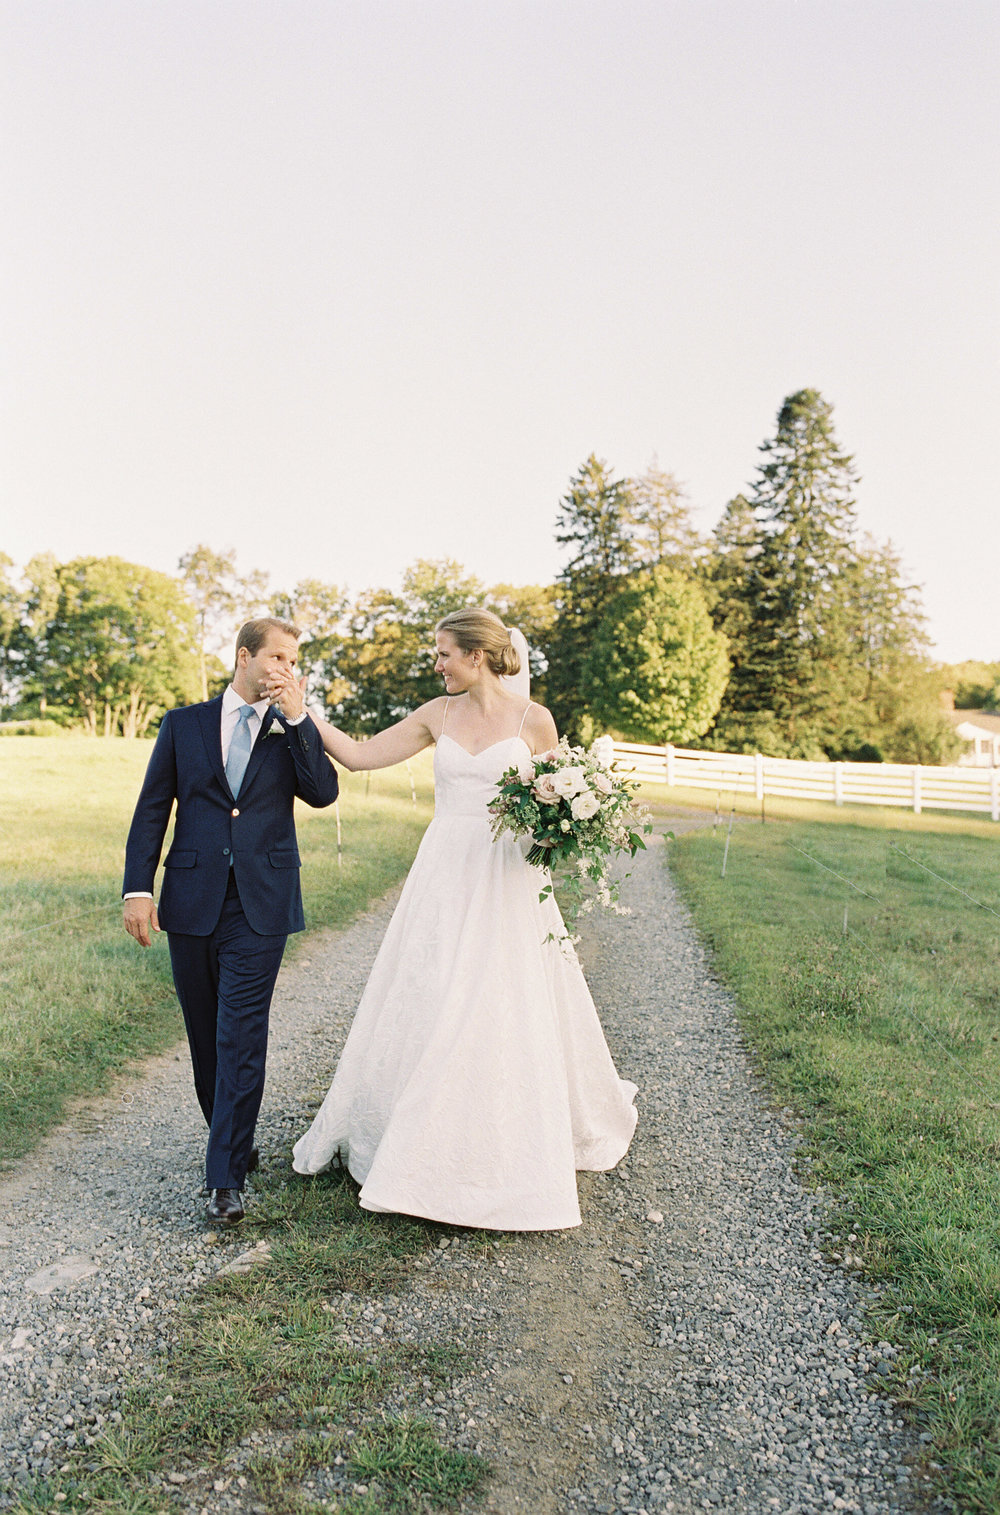 Connecticut-Wedding-37-Jen-Huang-20170909-KB-162-Jen_Huang-006796-R1-033.jpg